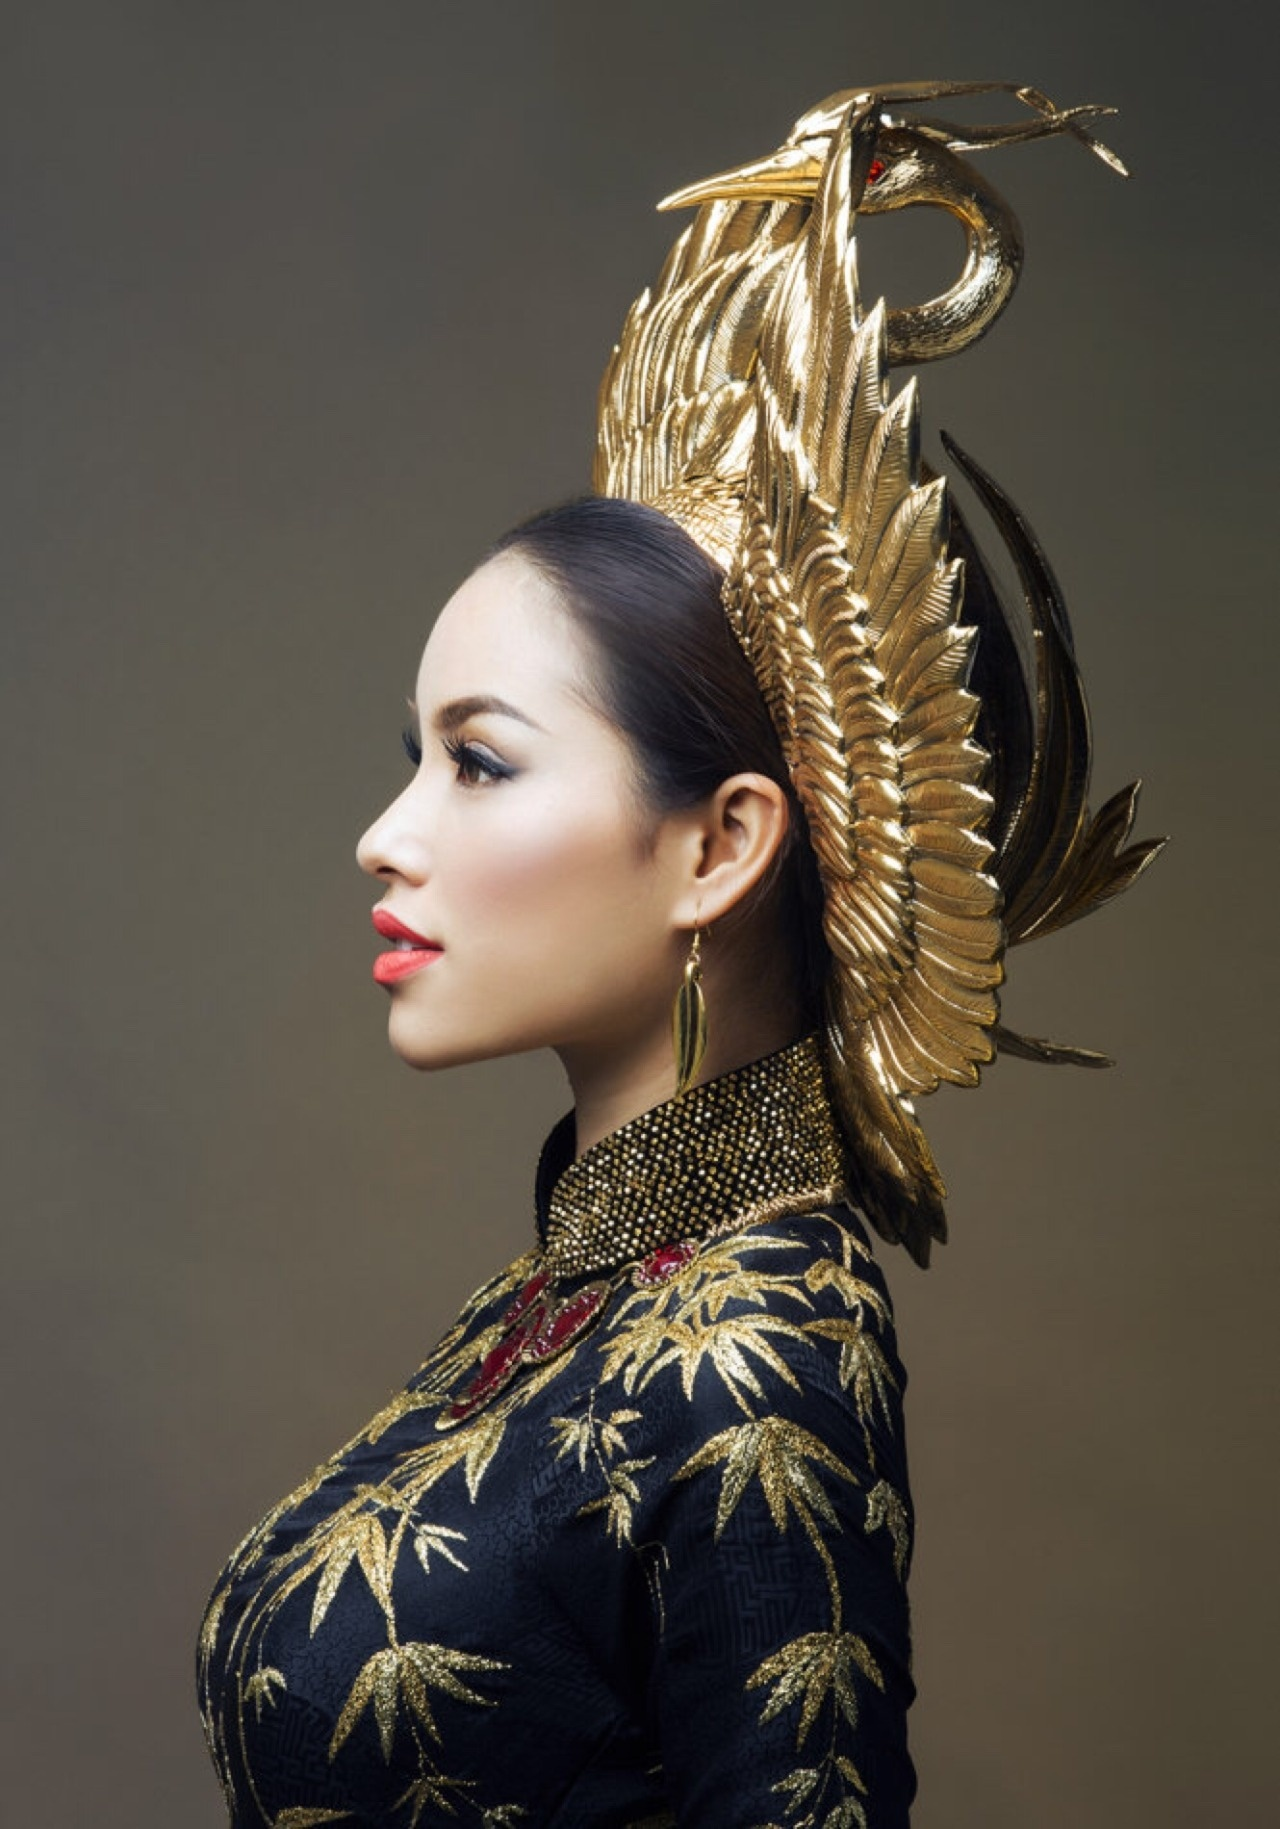 So phan khac biet cua 3 my nhan dang quang Hoa hau Hoan vu Viet Nam hinh anh 37